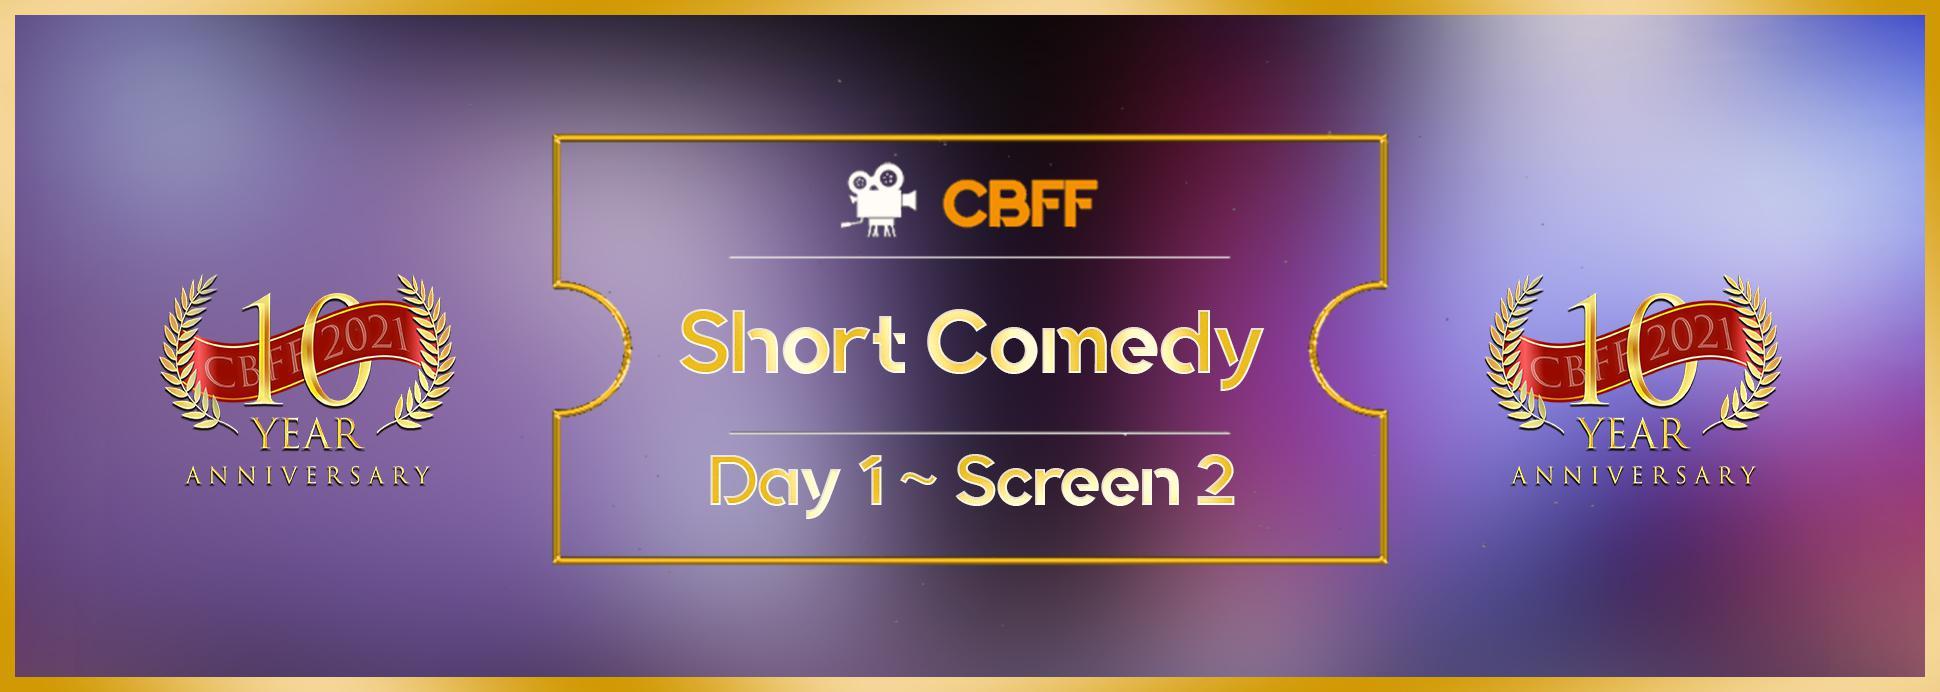 Day 1, Screen 2: Short Comedy